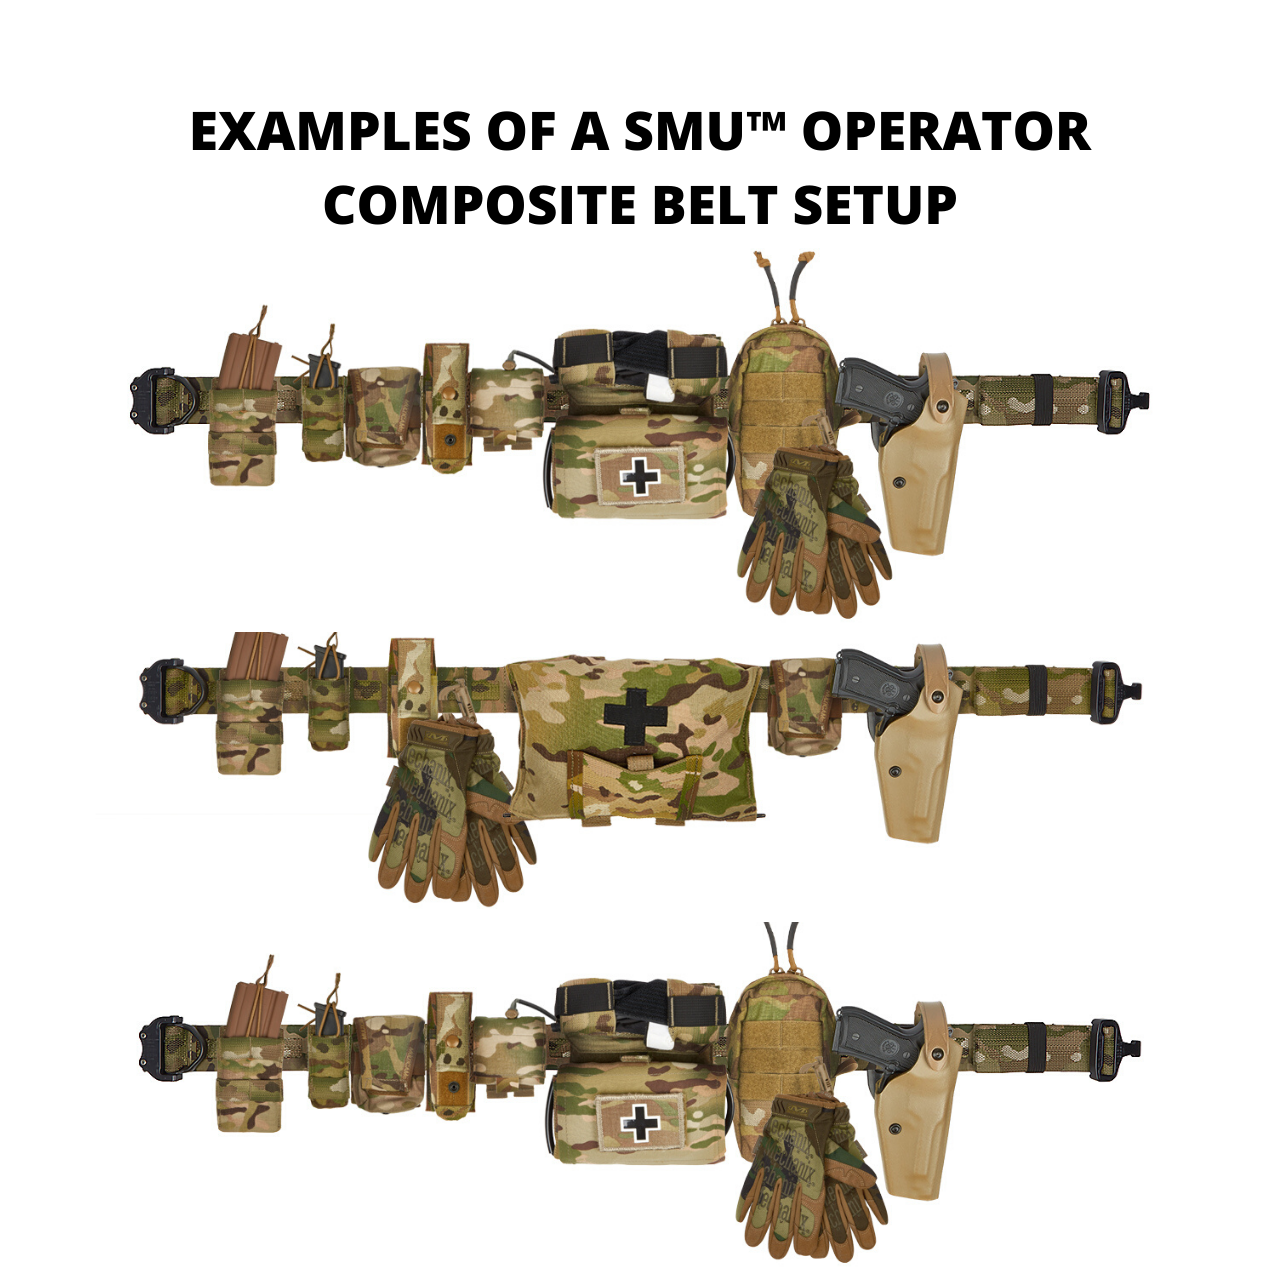 SMU™ OPERATOR COMPOSITE MOLLE BELT SET